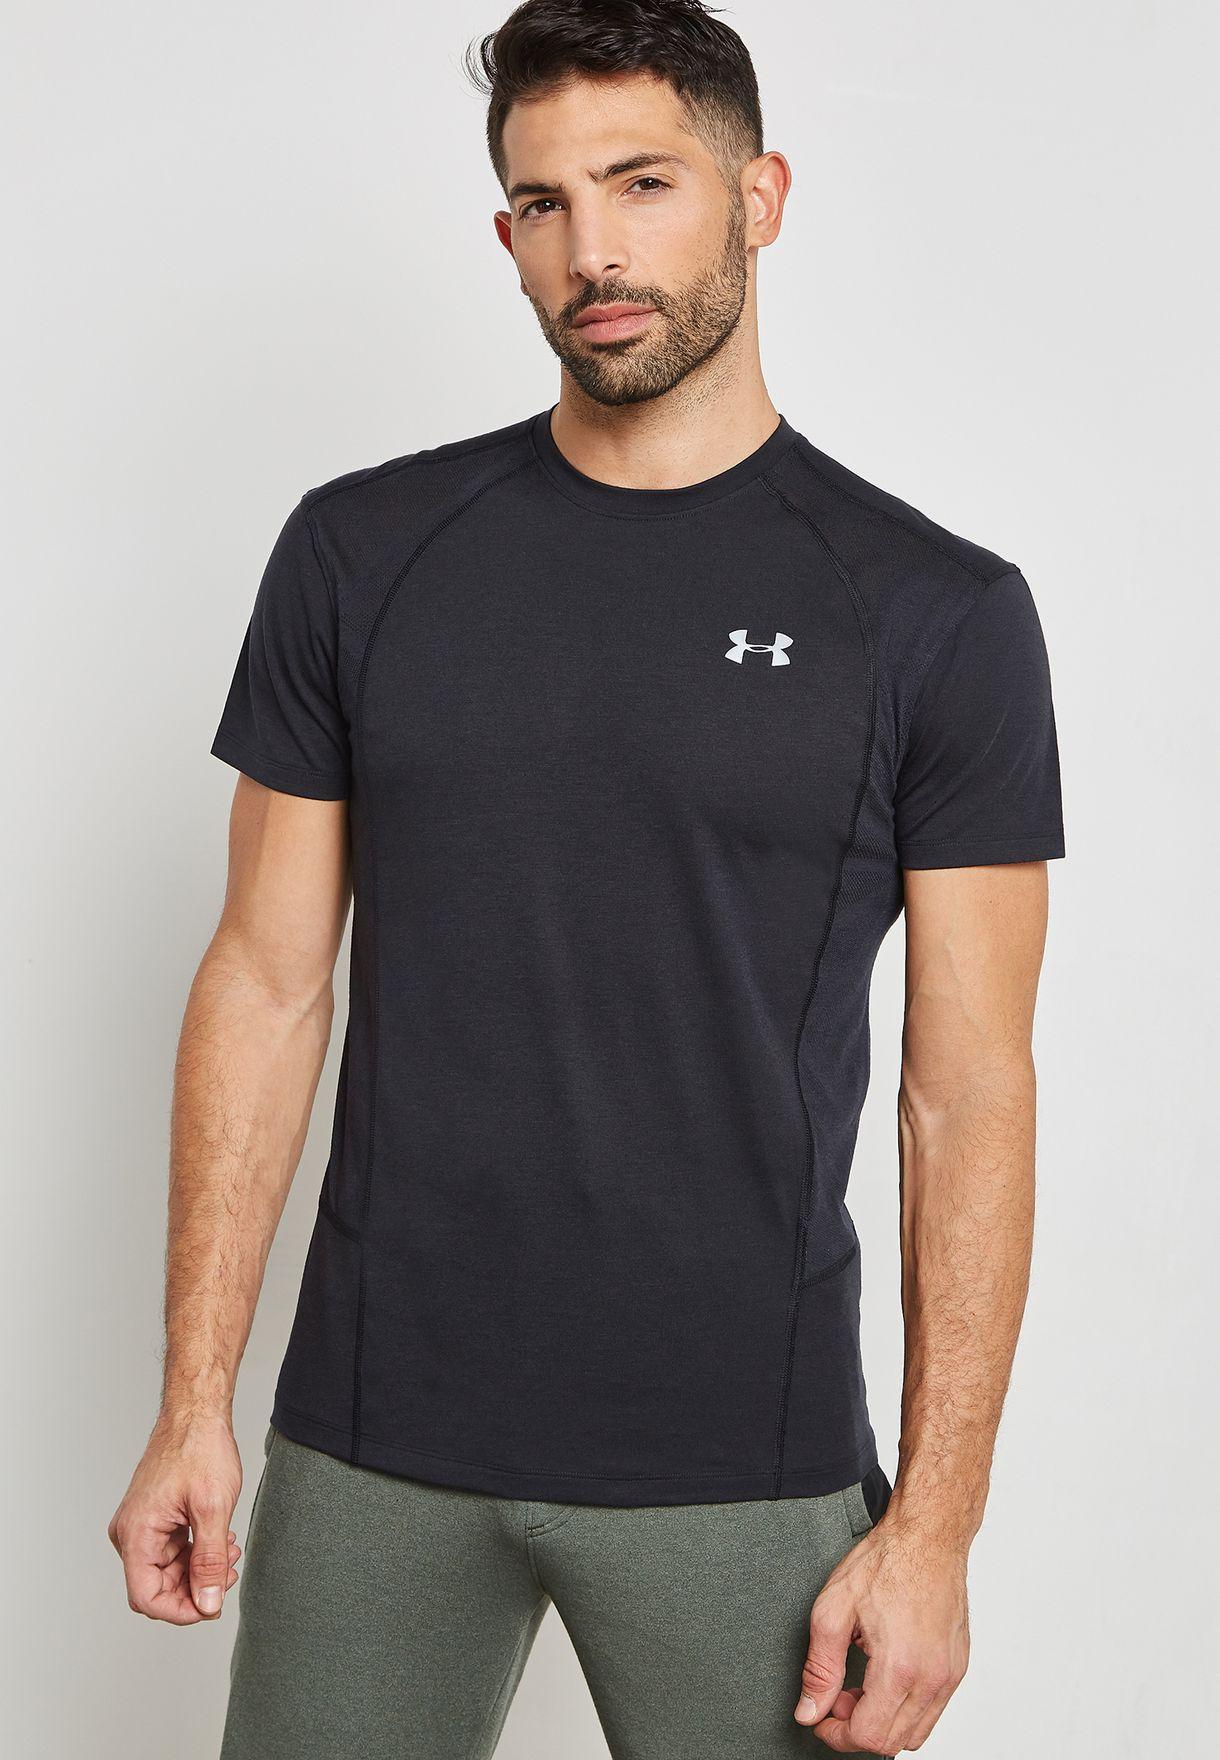 bf9ca5ae71b2 Shop Under Armour black Threadborne T-Shirt 1318417-001 for Men in ...